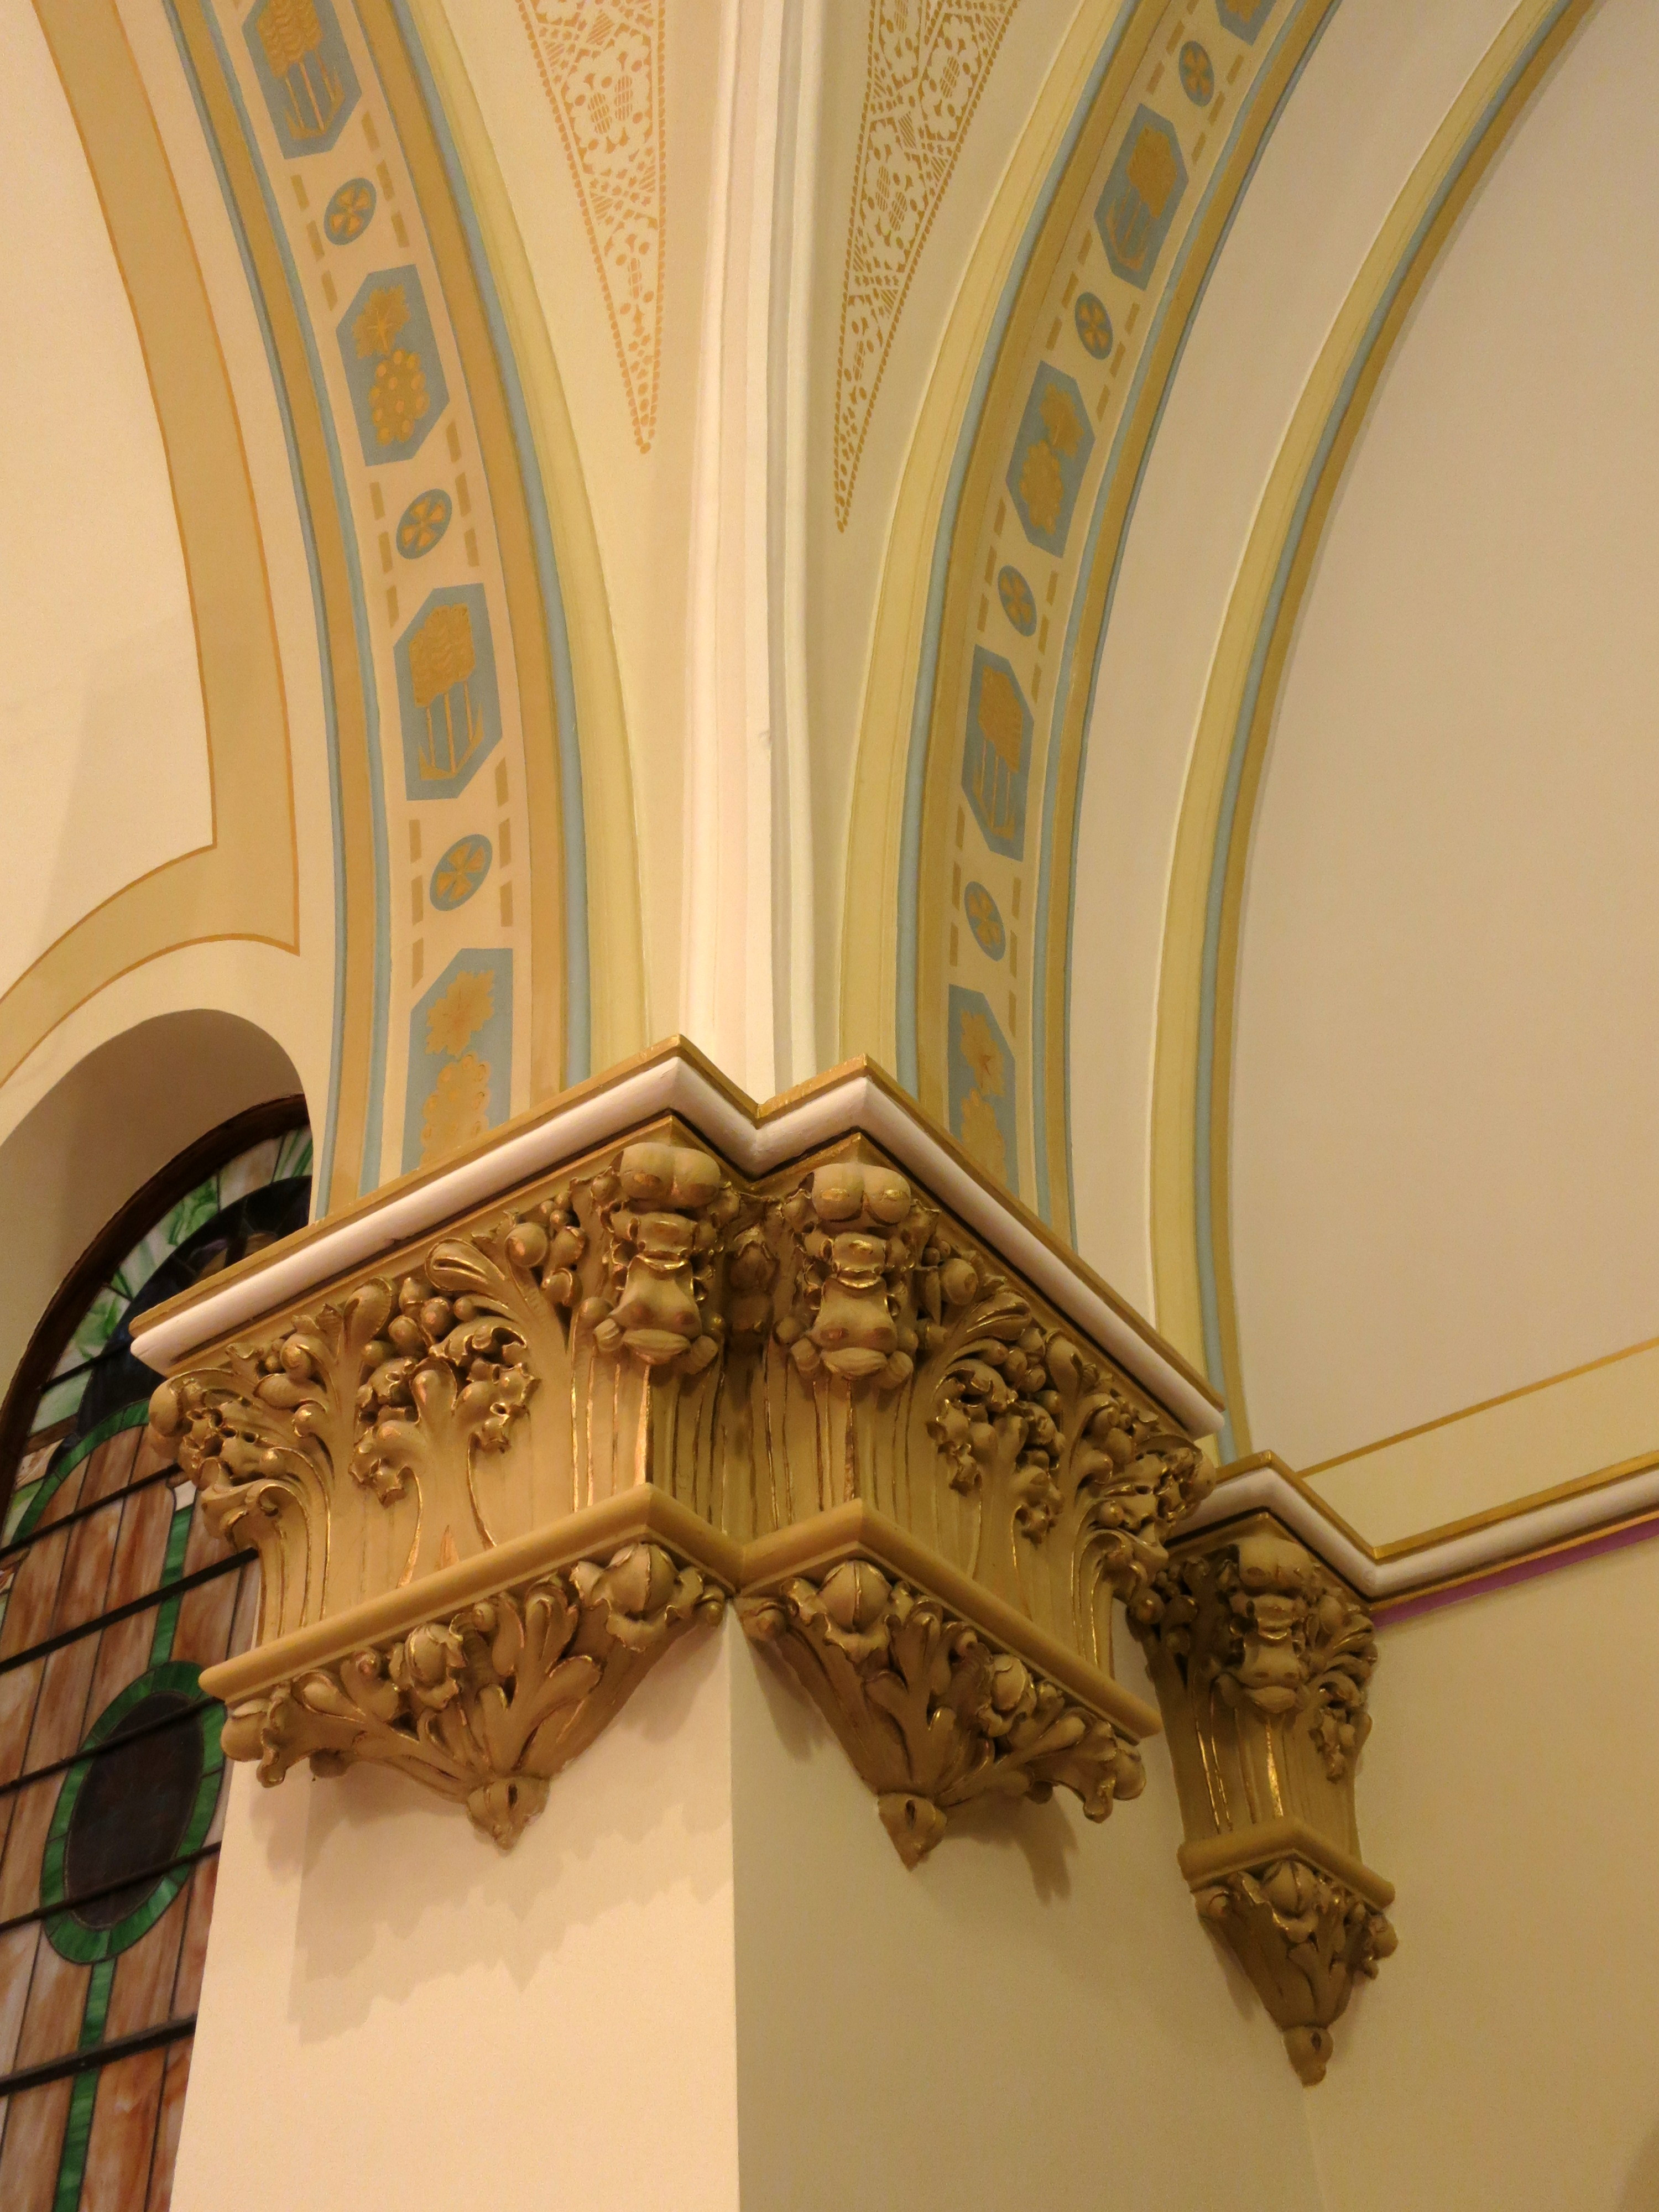 corbel and for islands best decoration homebnc victorian corbels decorative ideas designs kitchen decor